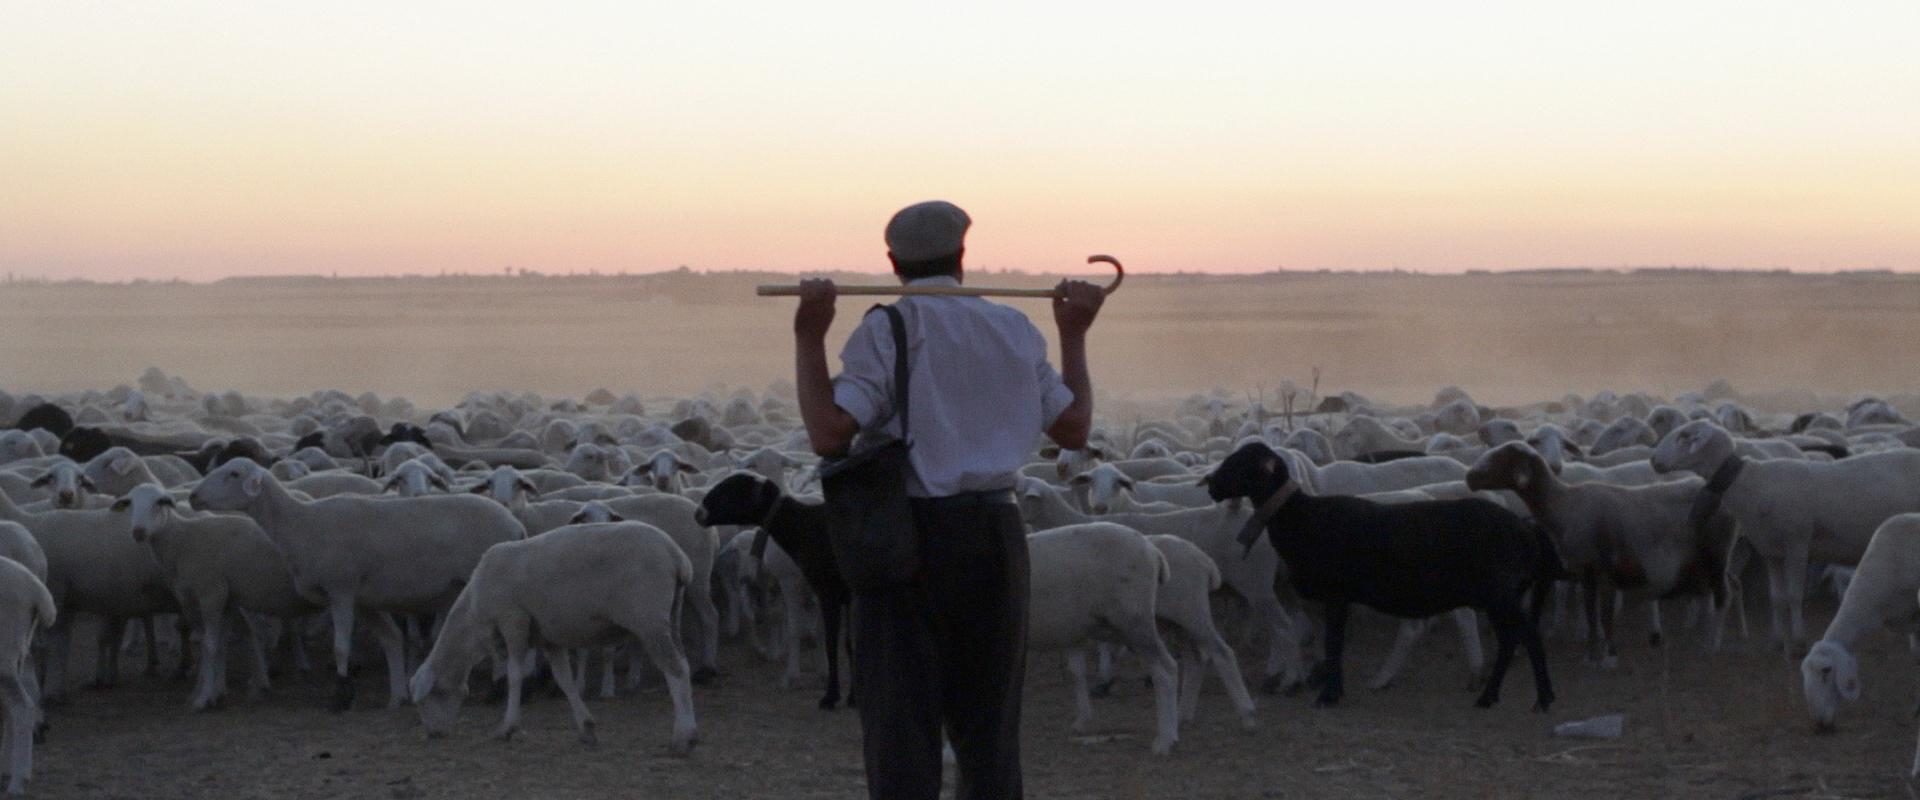 The Shepherd still